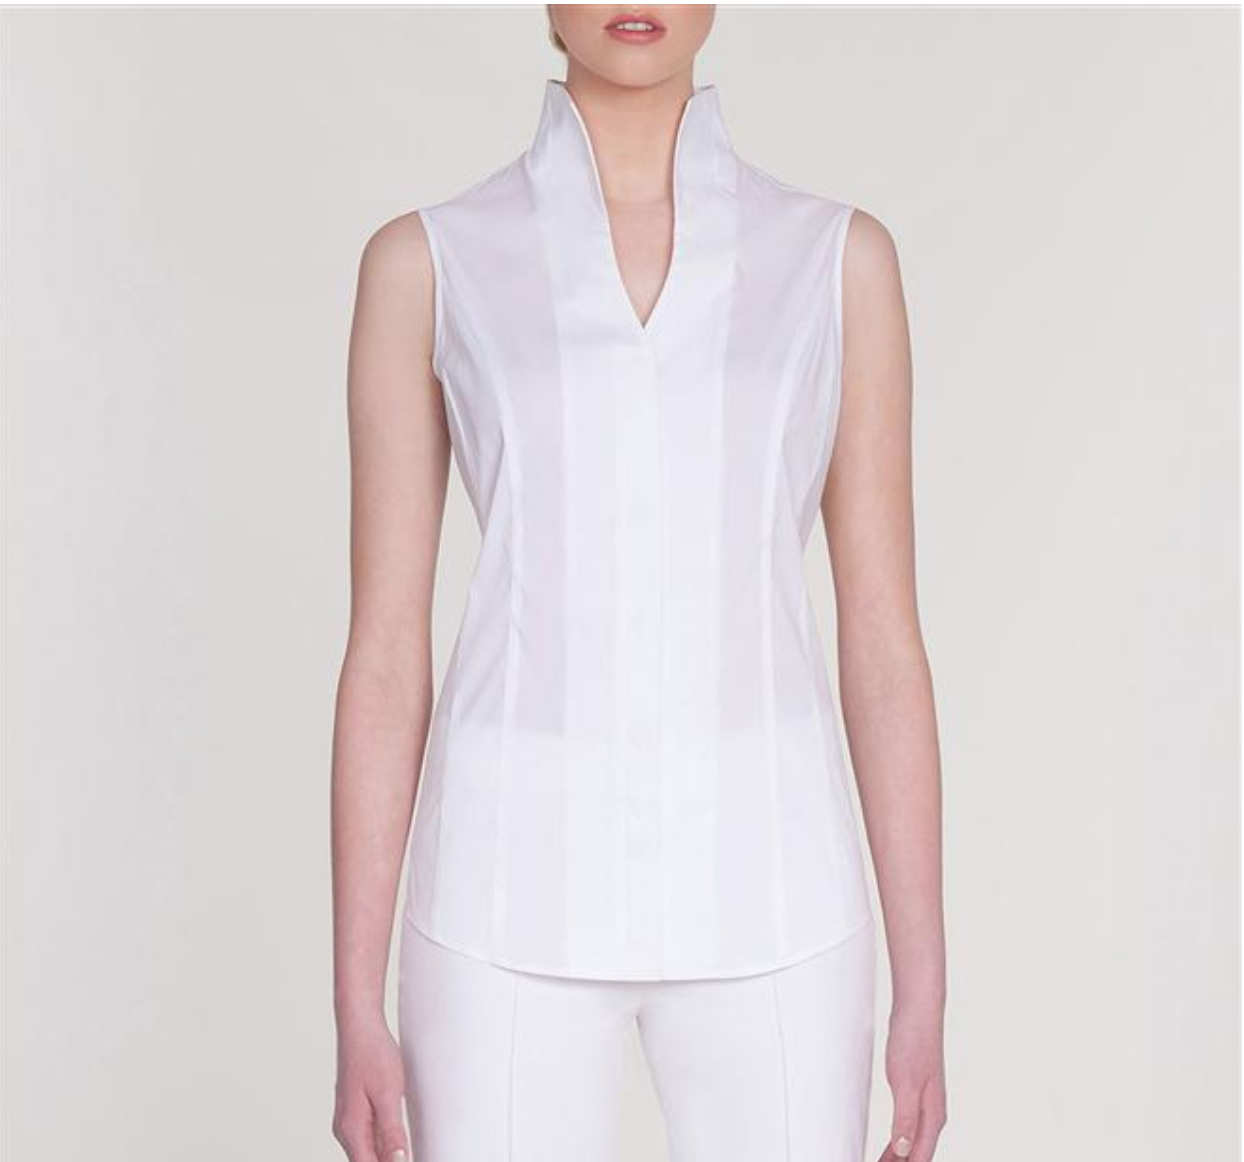 "<a href=""http://www.misook.com/item/k1900f/201302/stretch-cotton-sleeveless-blouse?utm_source=gcfam&utm_medium=TK&utm_campaign=MSK7591"" rel=""nofollow""> Stretch Cotton Sleeveless Blouse</a>"